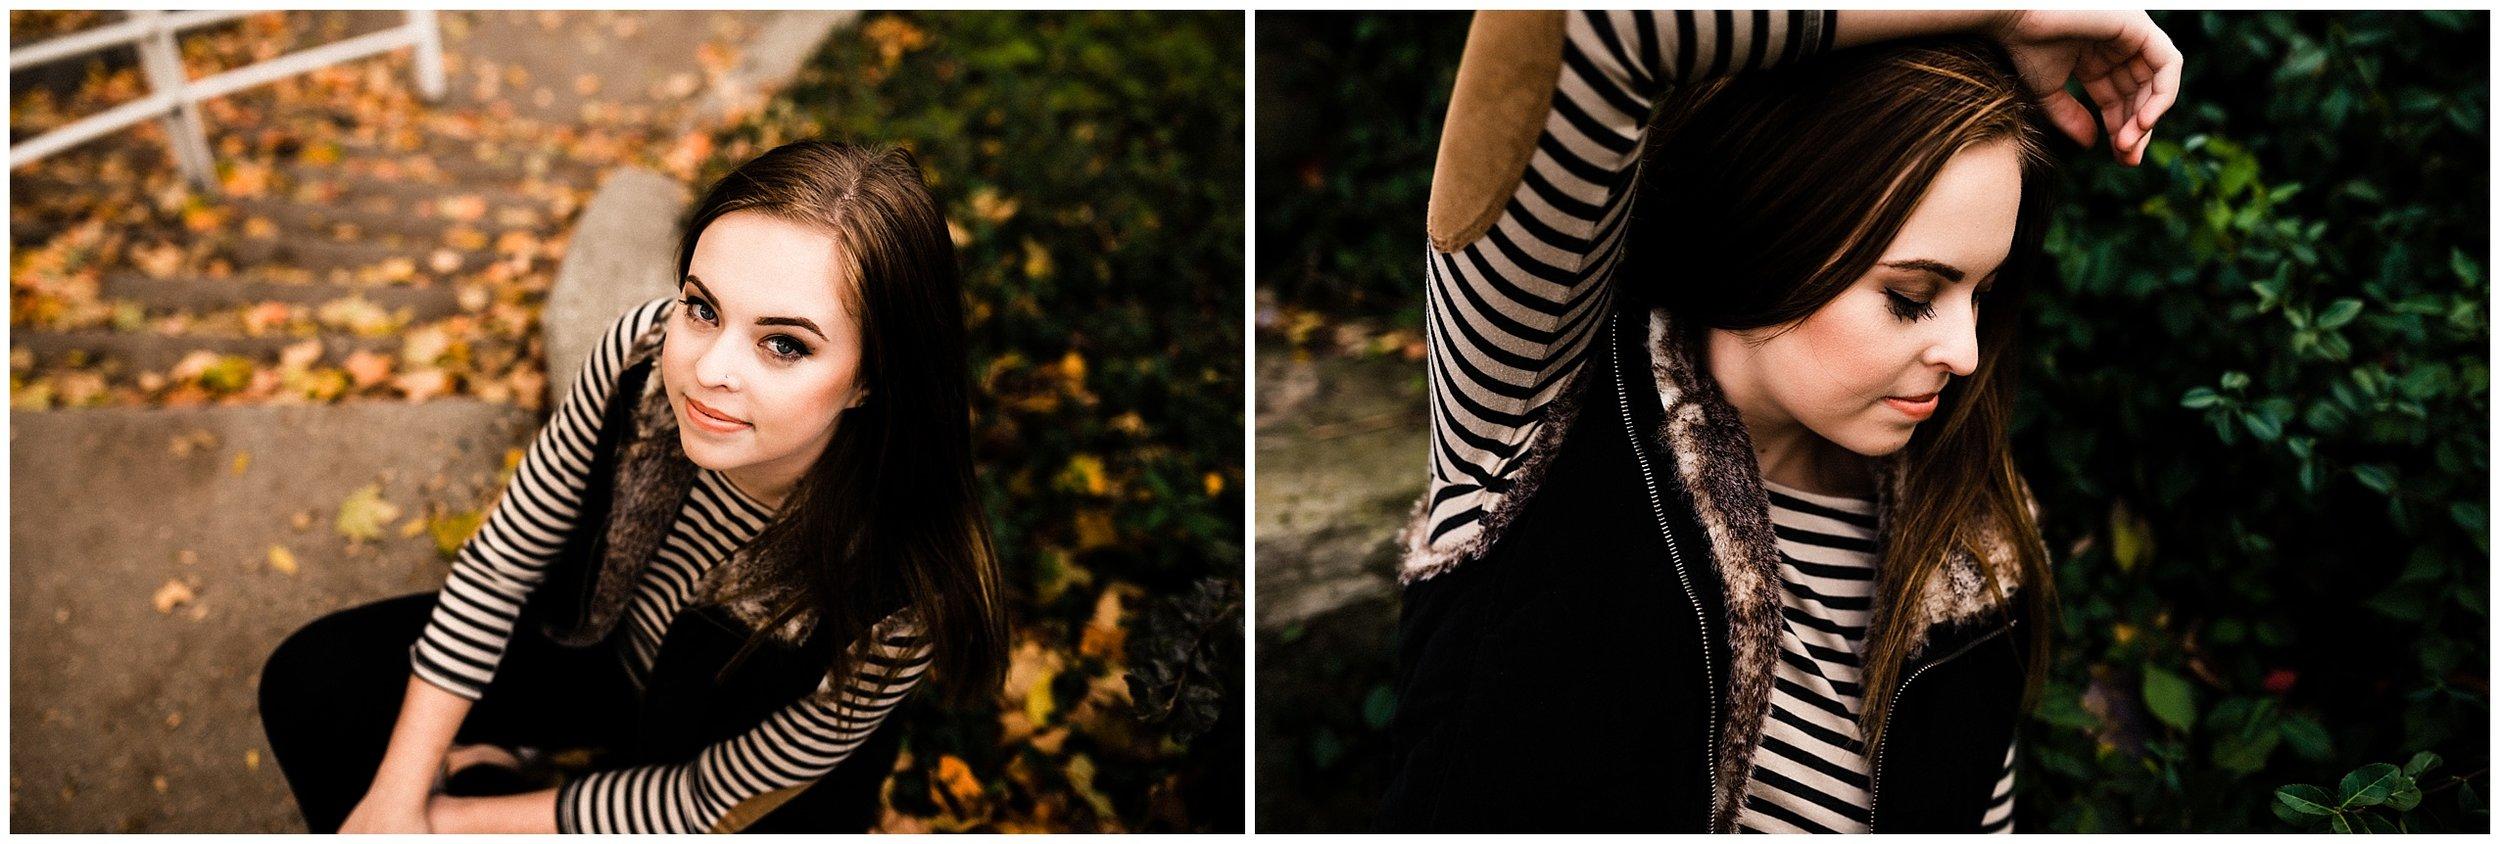 Brielle | Senior #kyleepaigephotography_1694.jpg